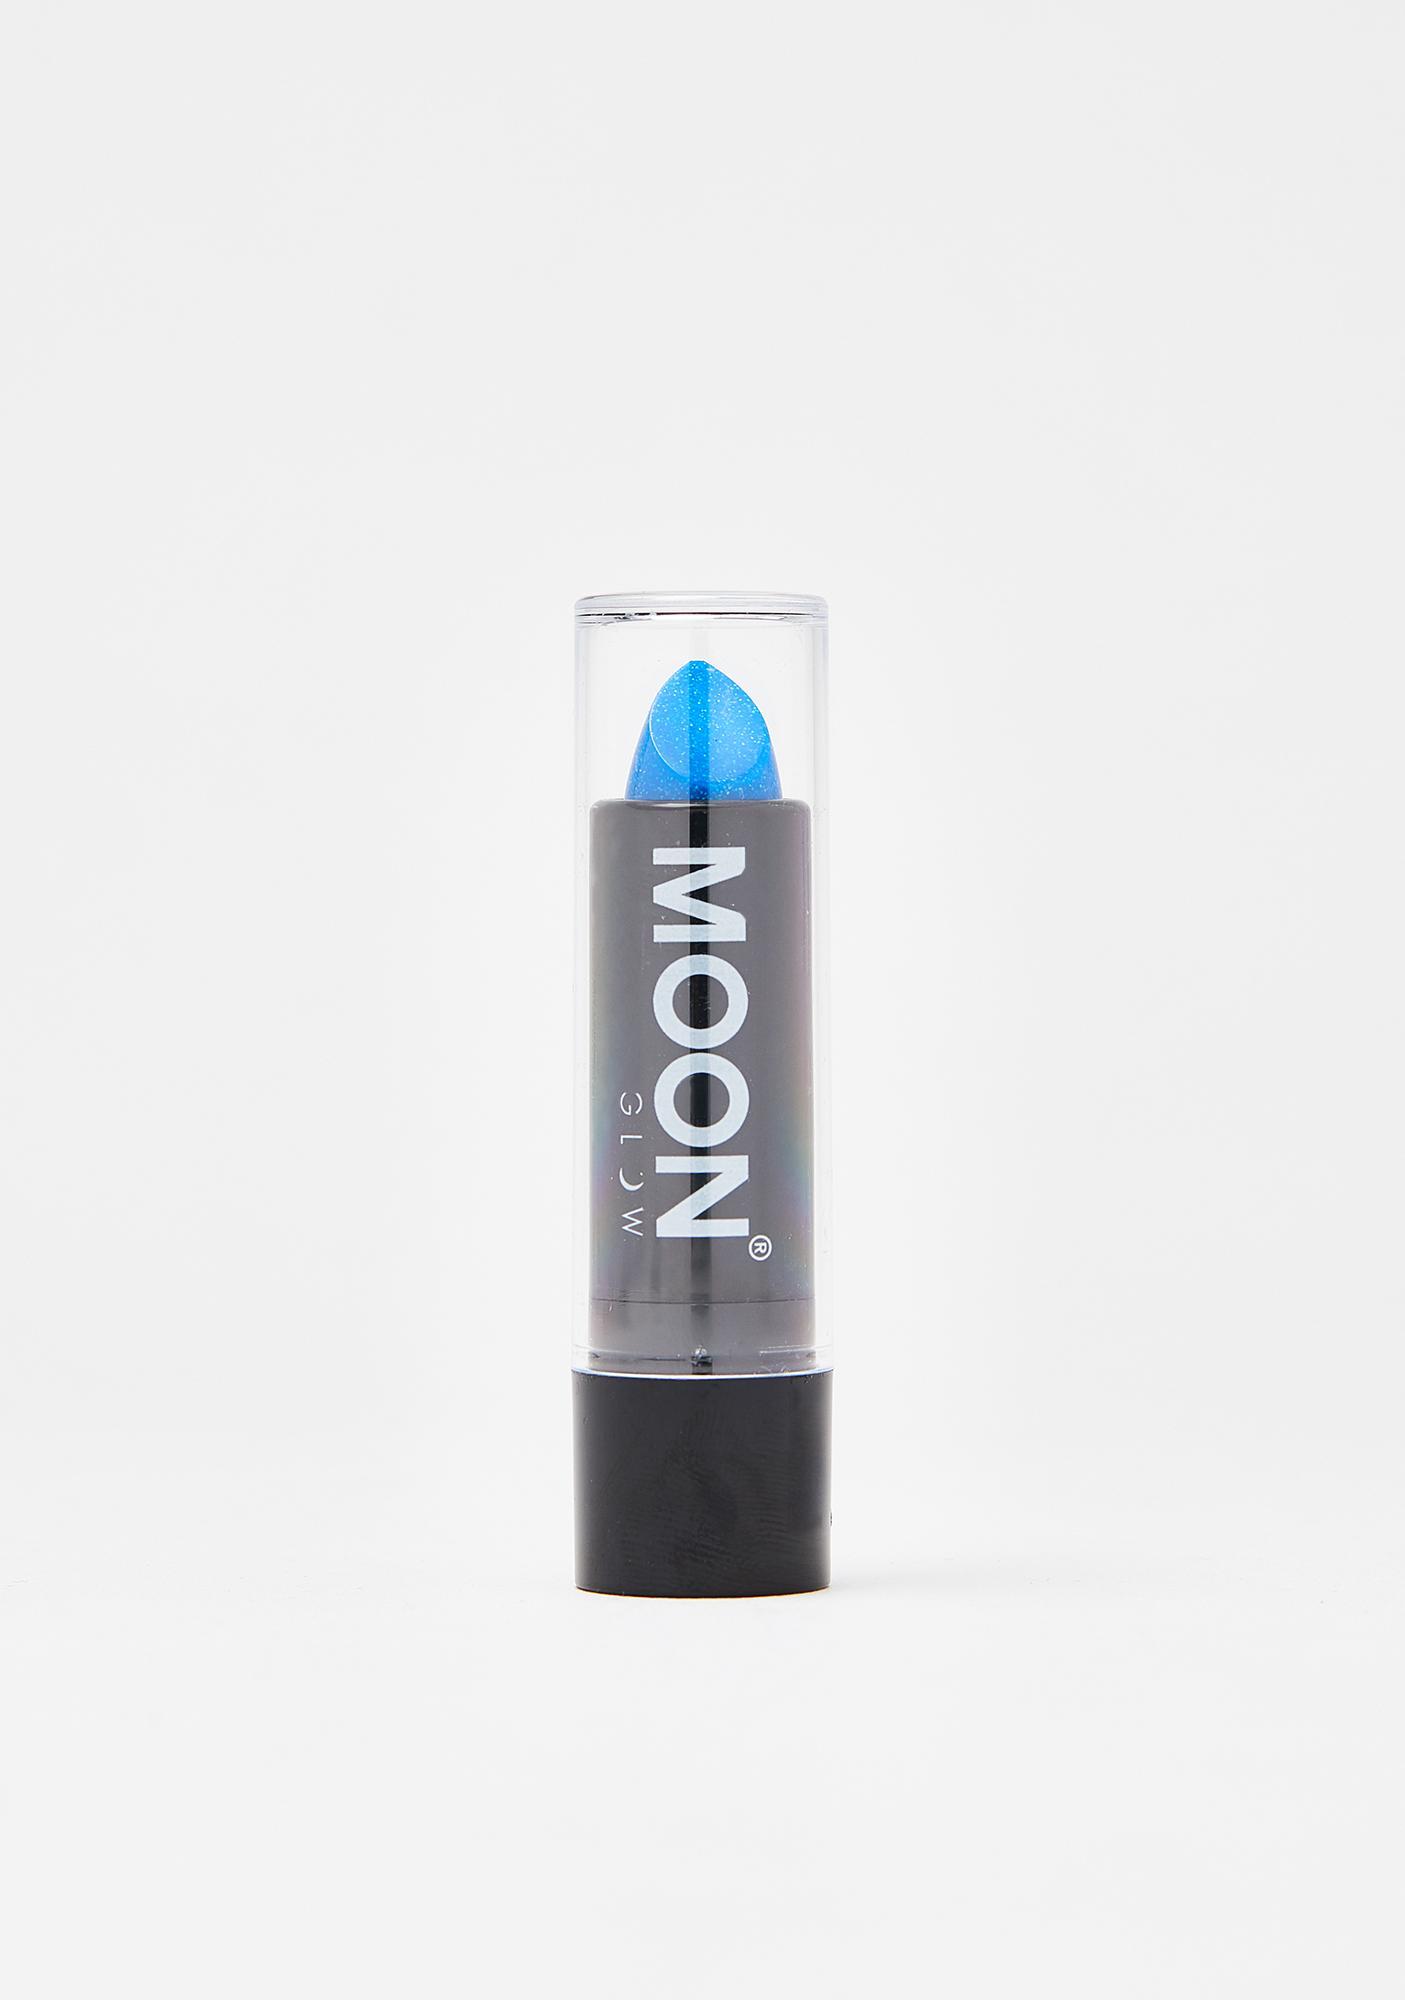 Moon Creations Blue Holographic Glitter Lipstick